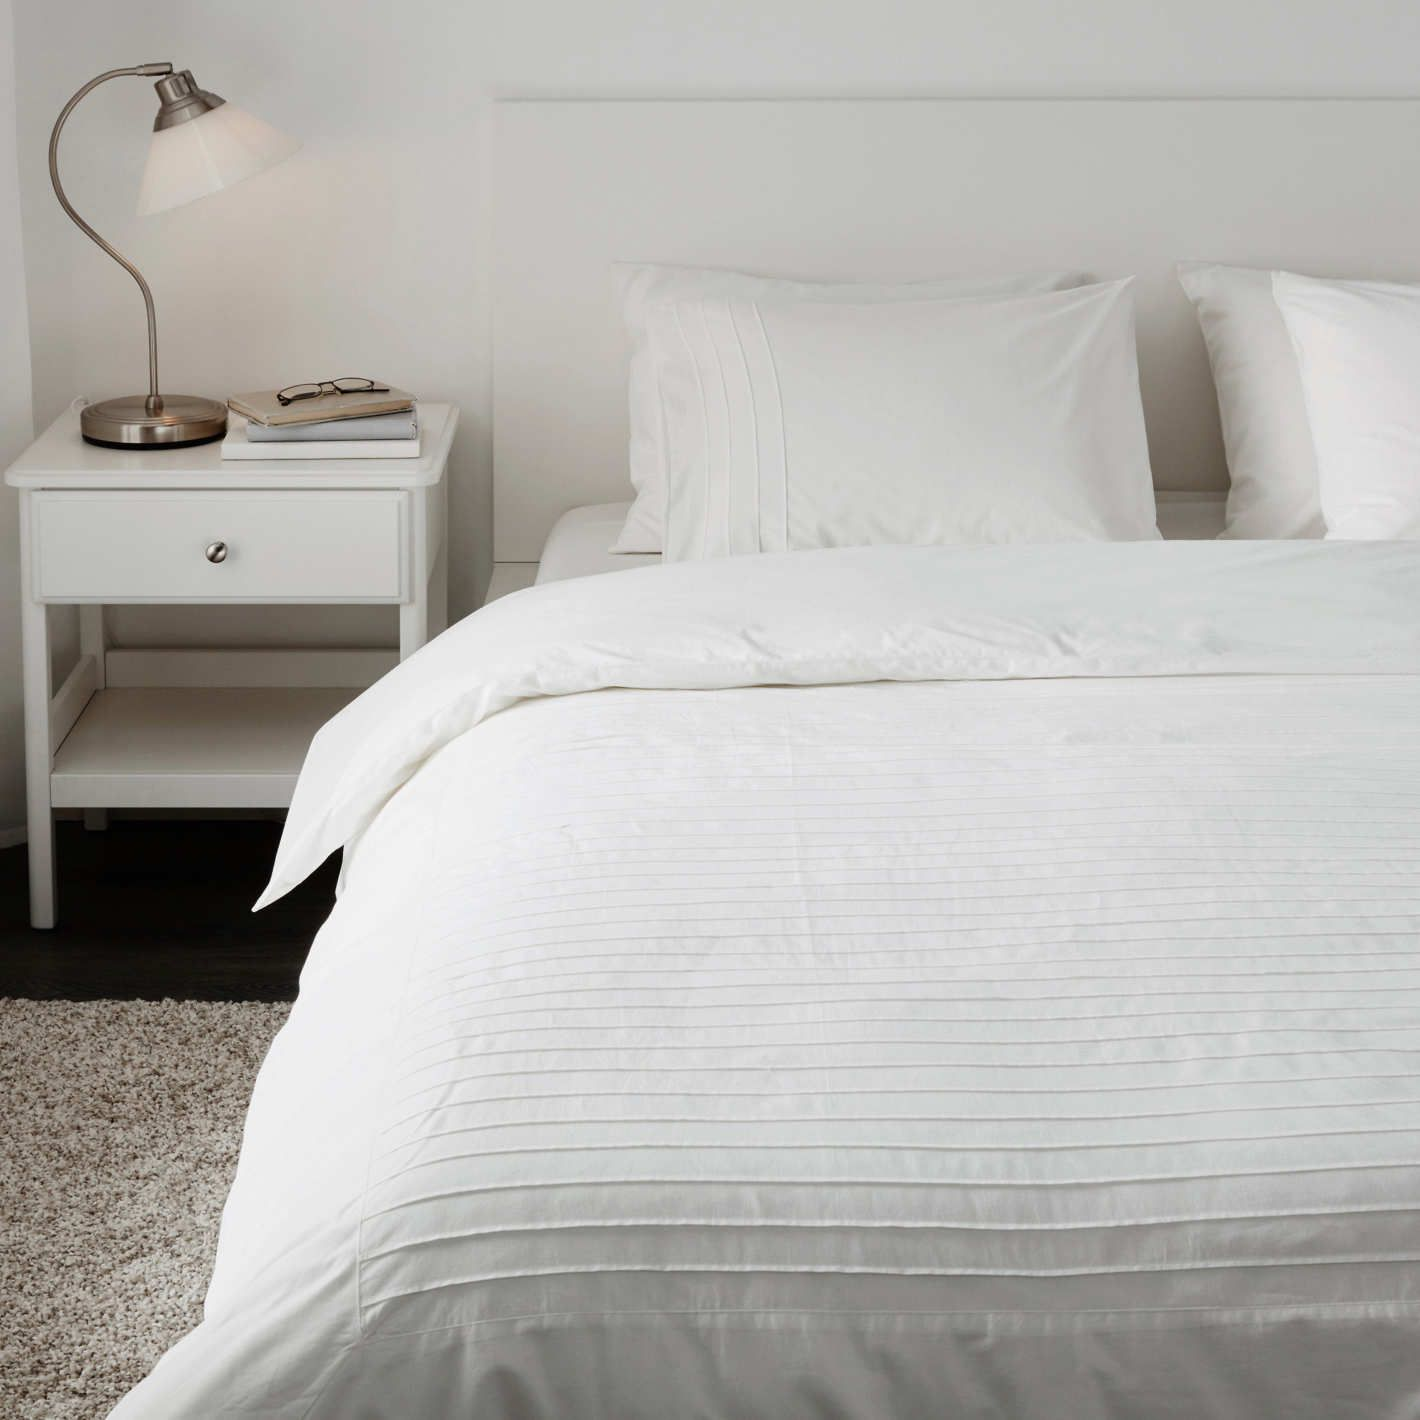 The Best Duvet Covers, According to Interior Designers